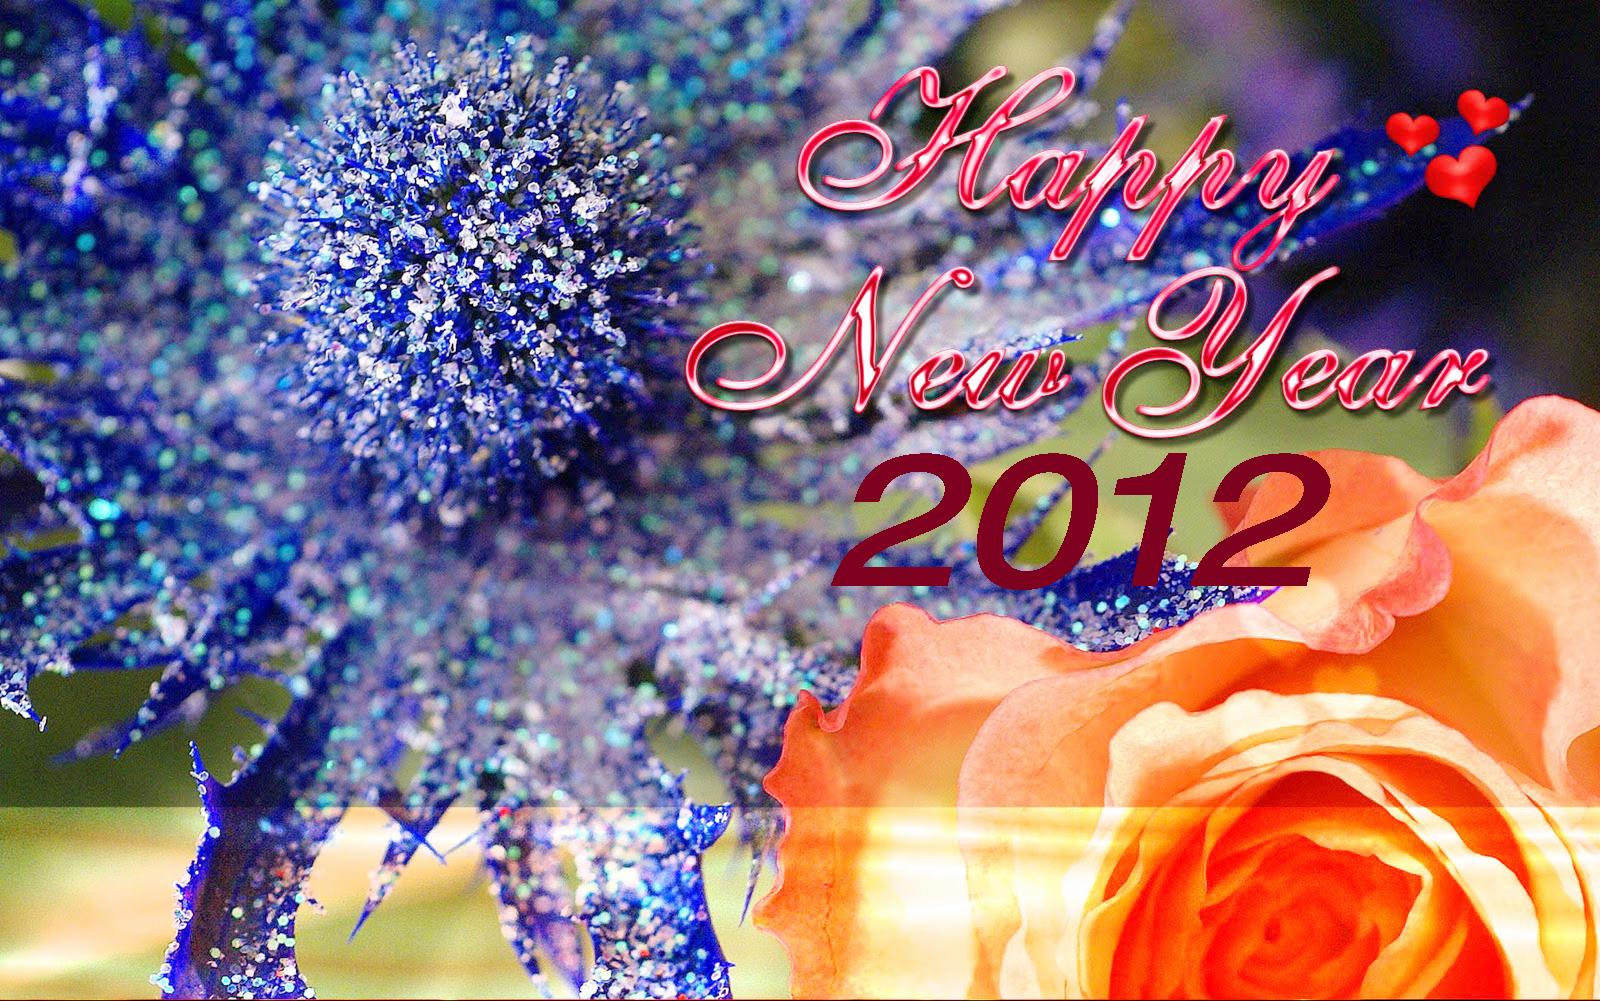 kono bae iki new year 2012